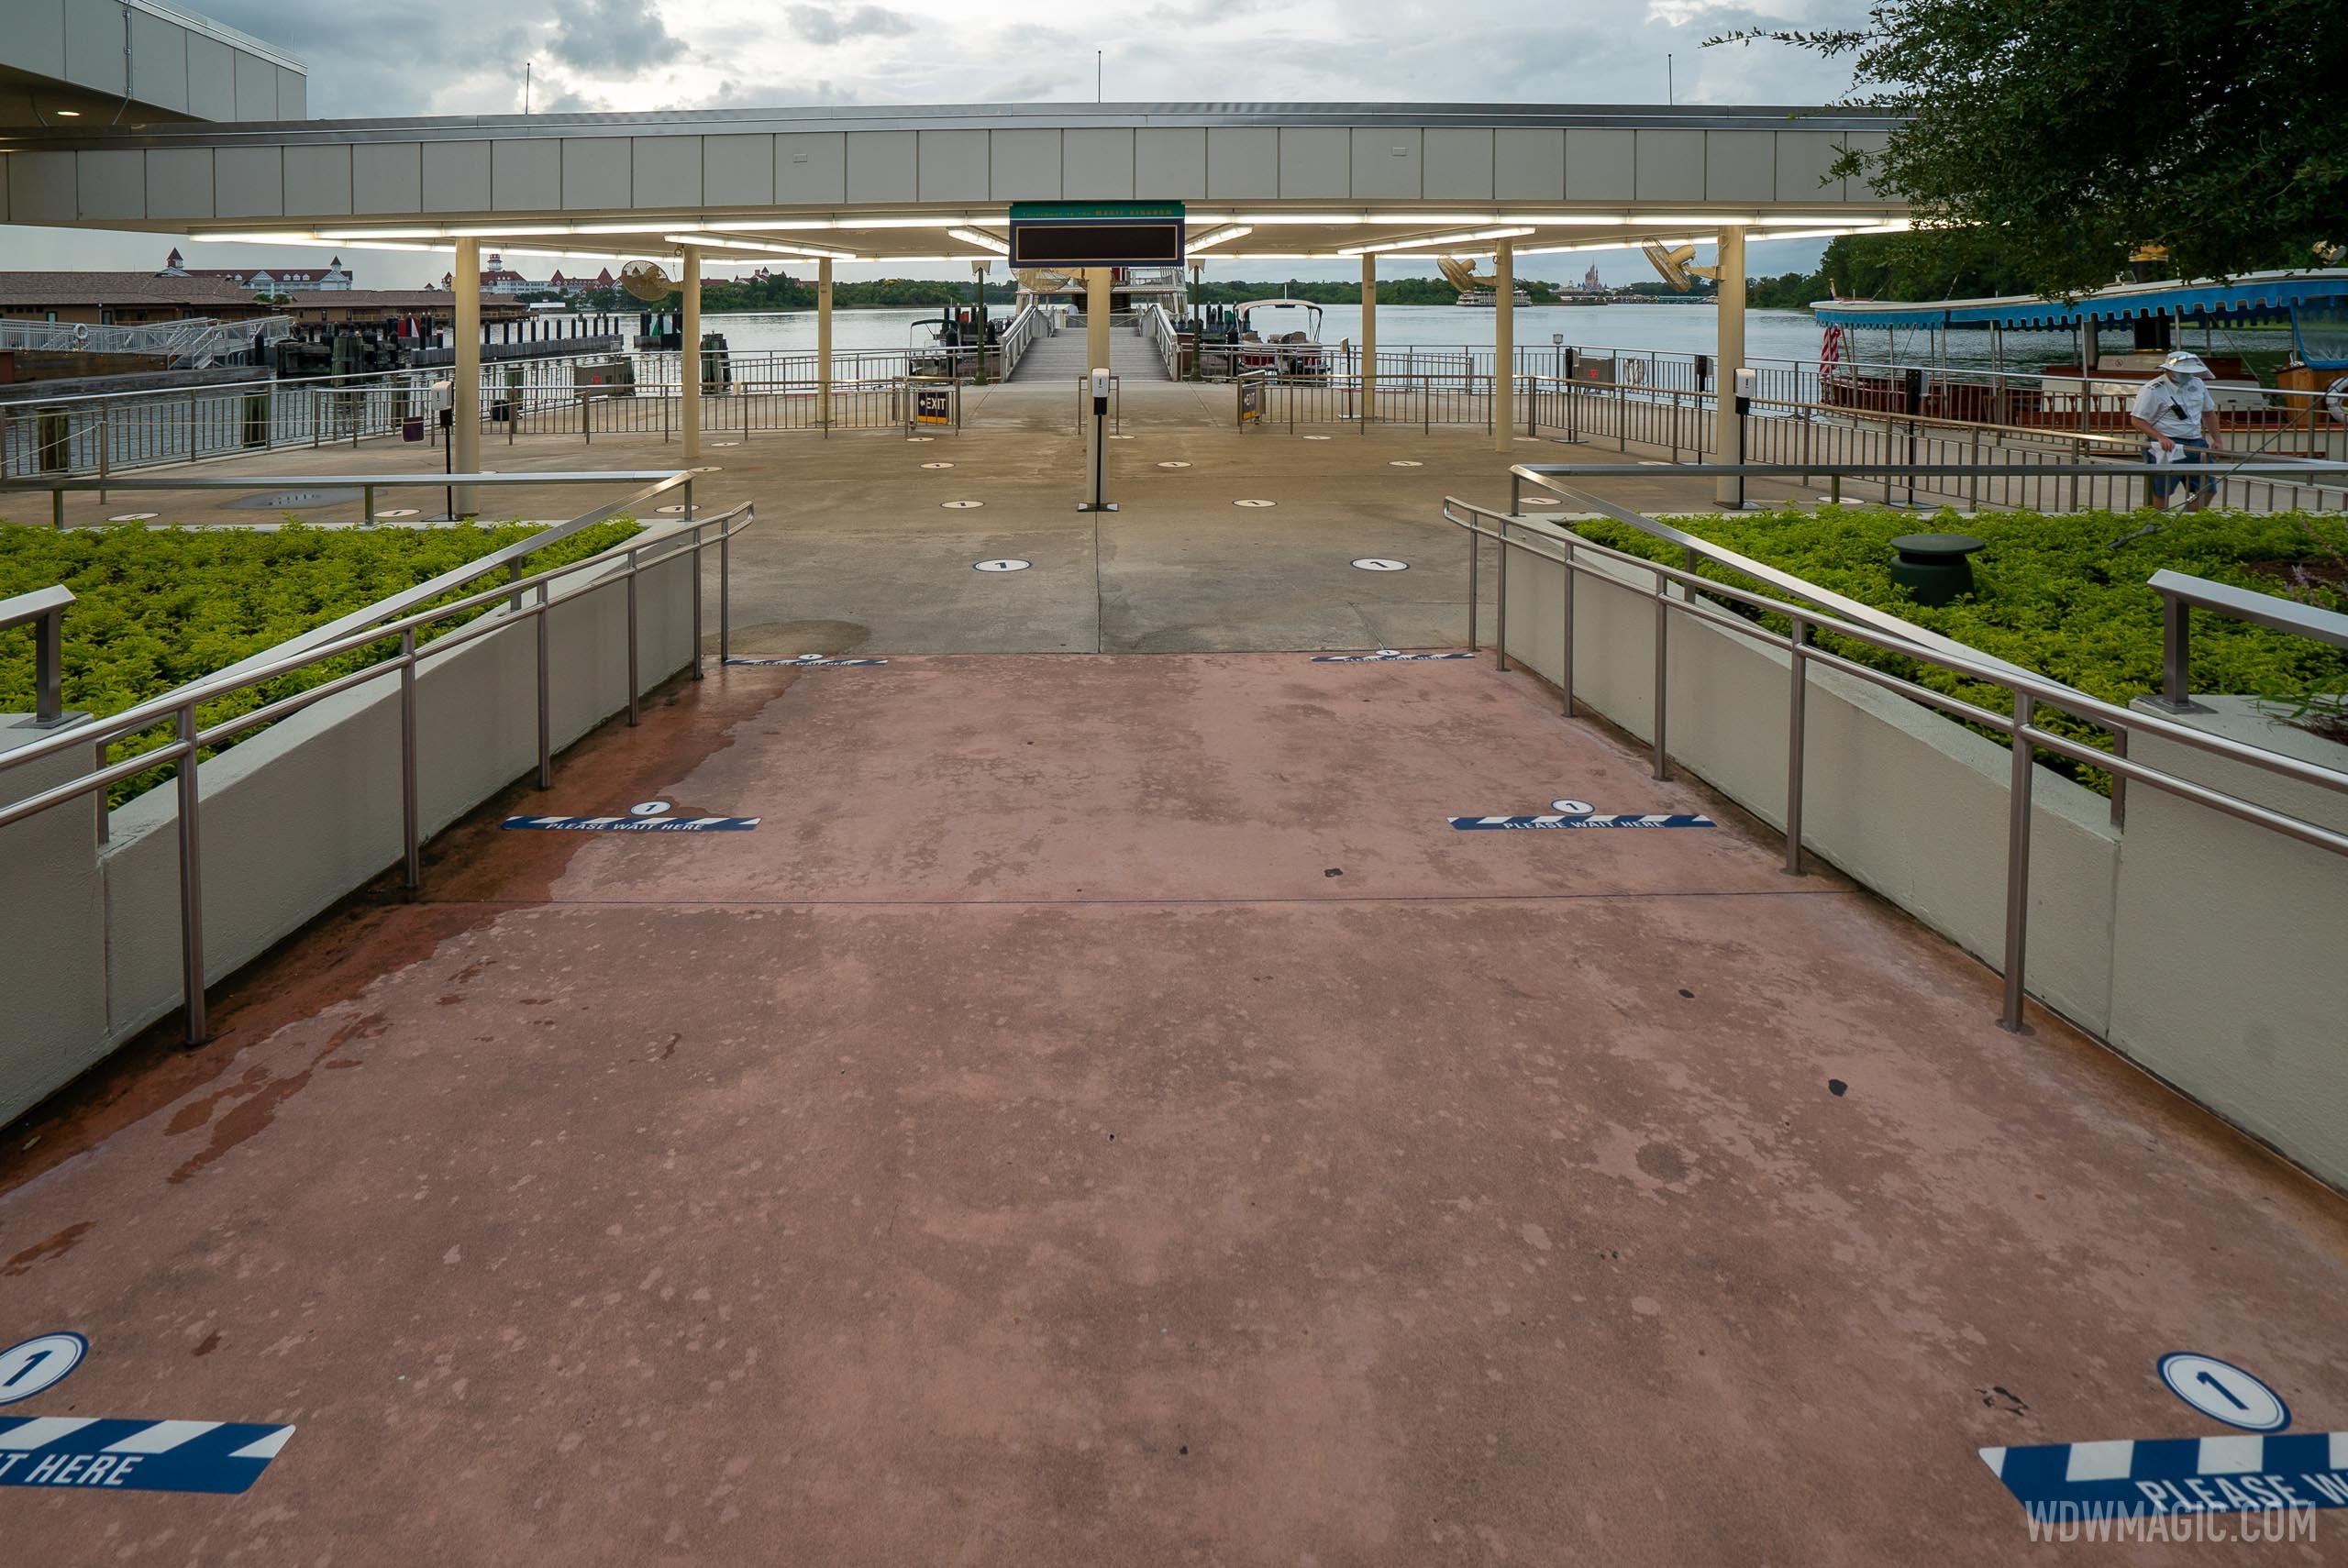 Magic Kingdom reopening from COVID-19 closure